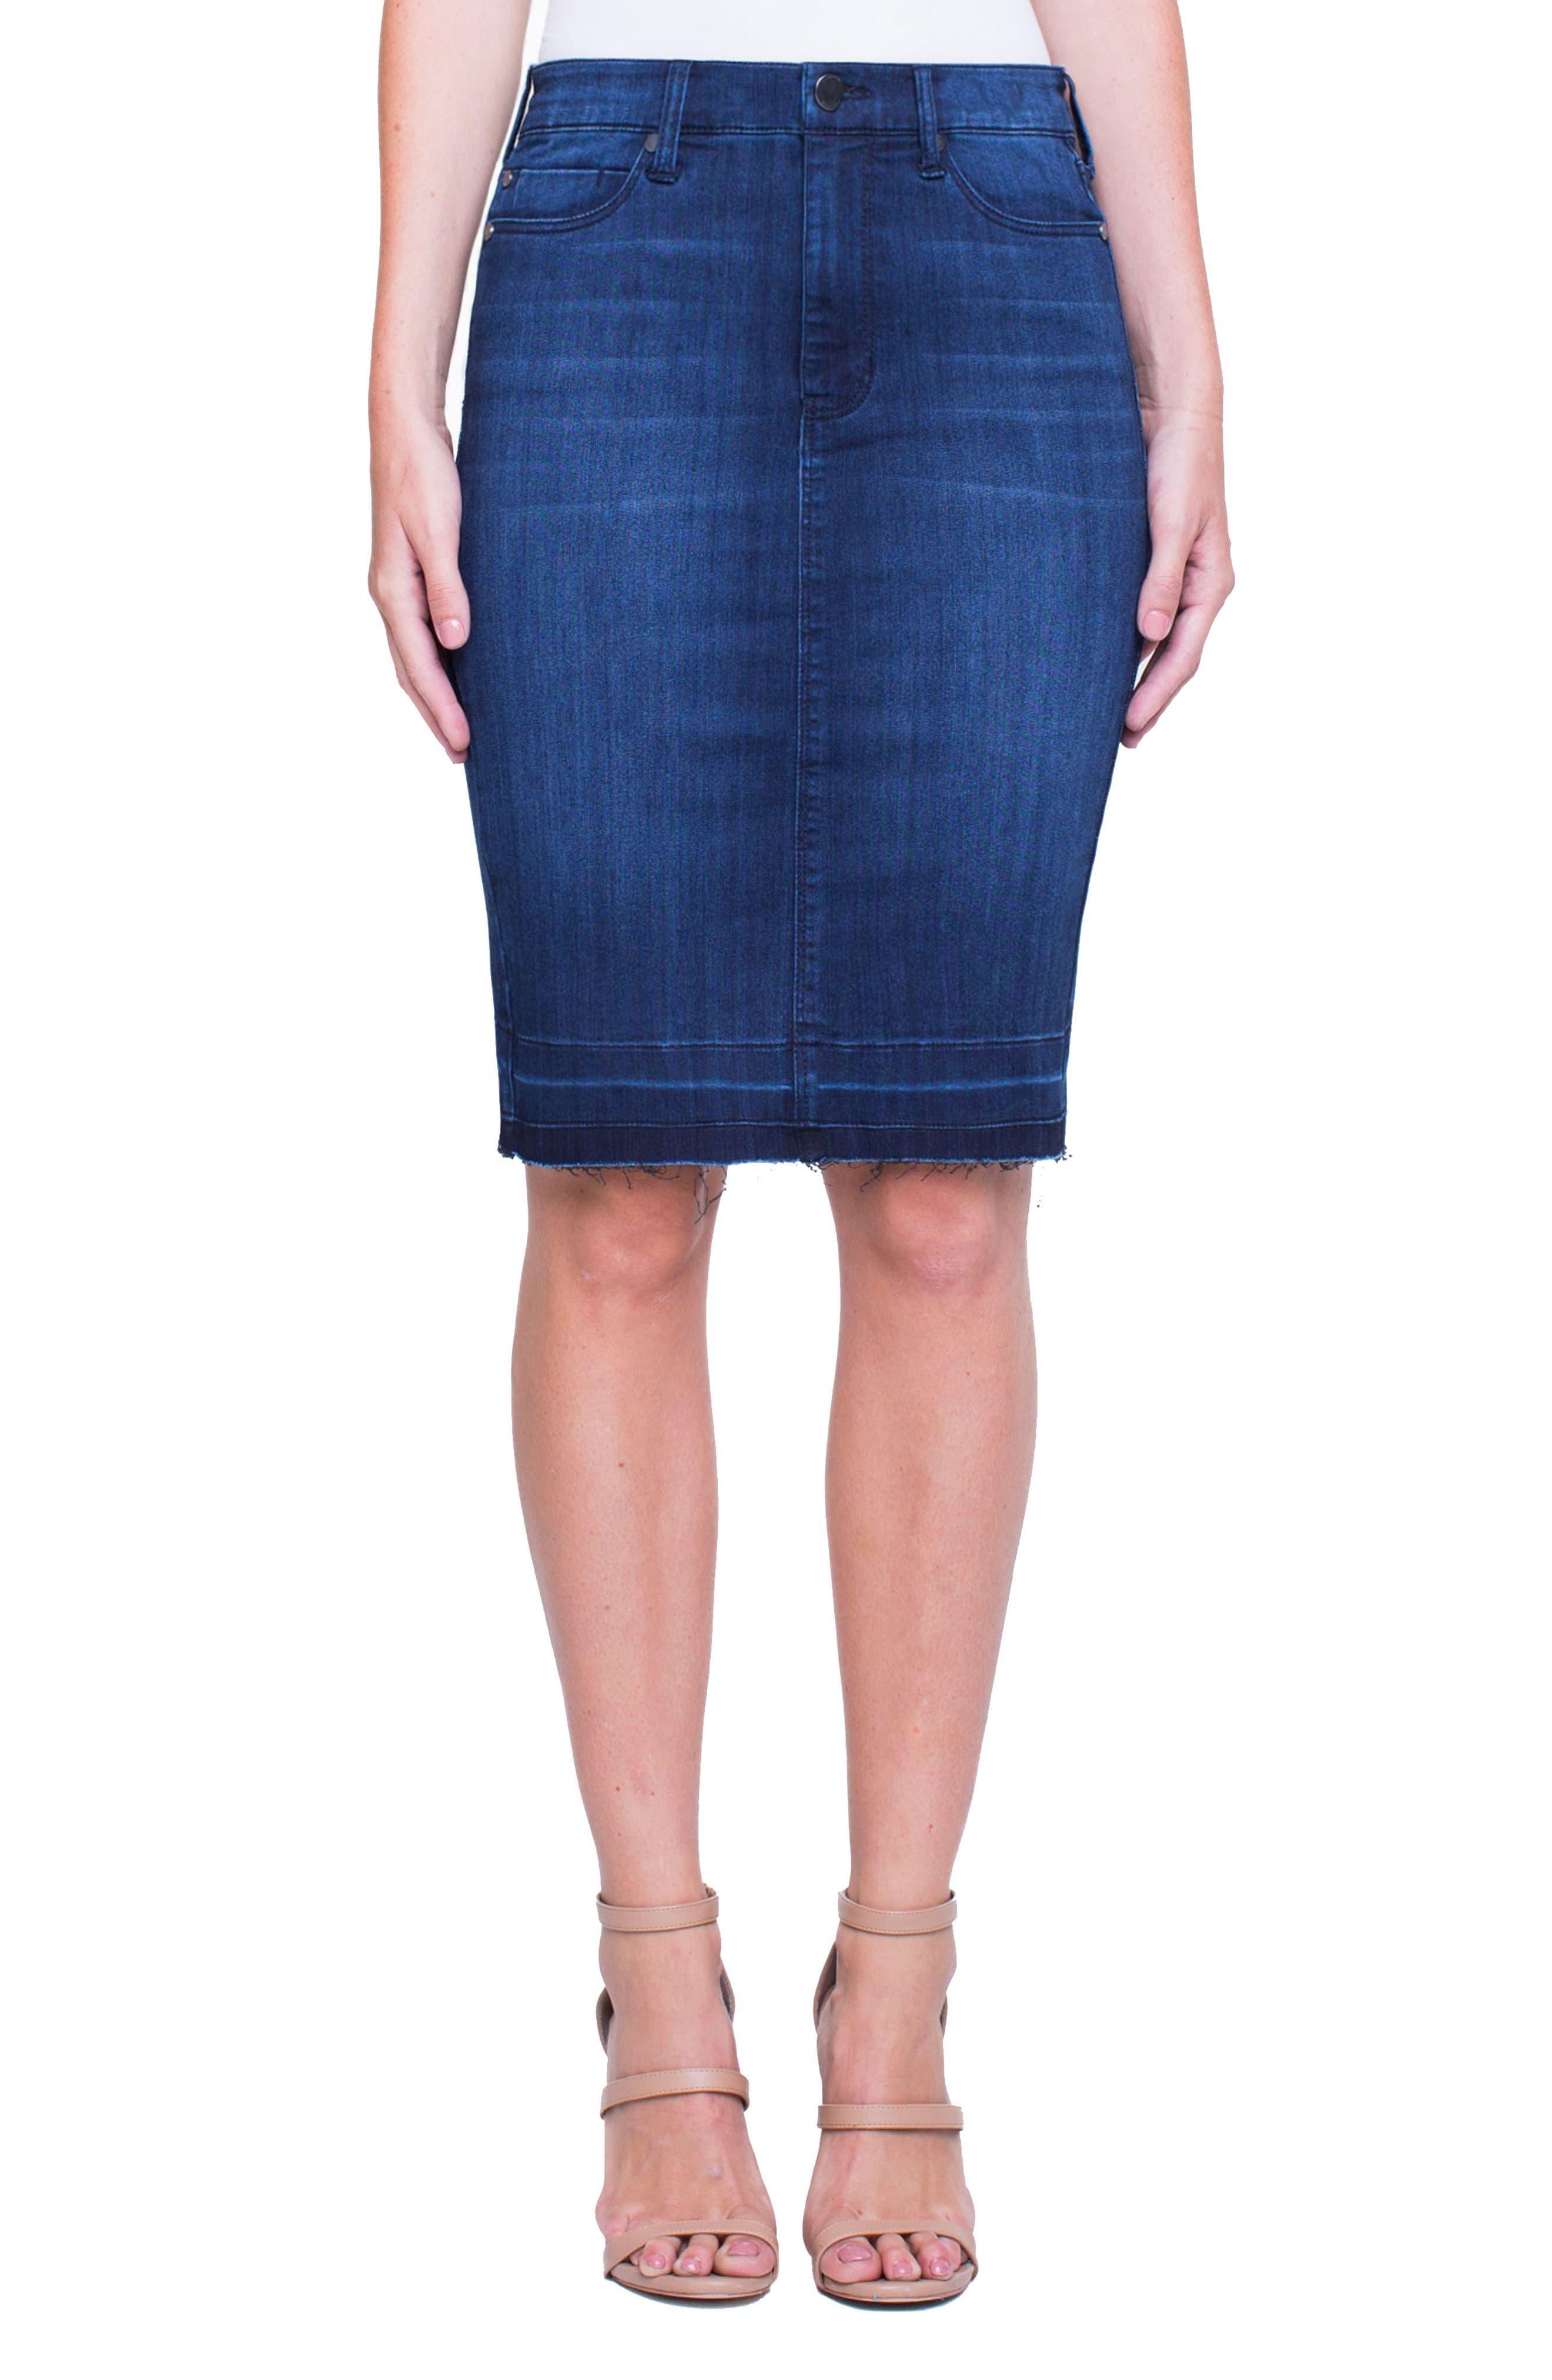 Alternate Image 1 Selected - Liverpool Jeans Company Denim Pencil Skirt (Estrella Med Dark)